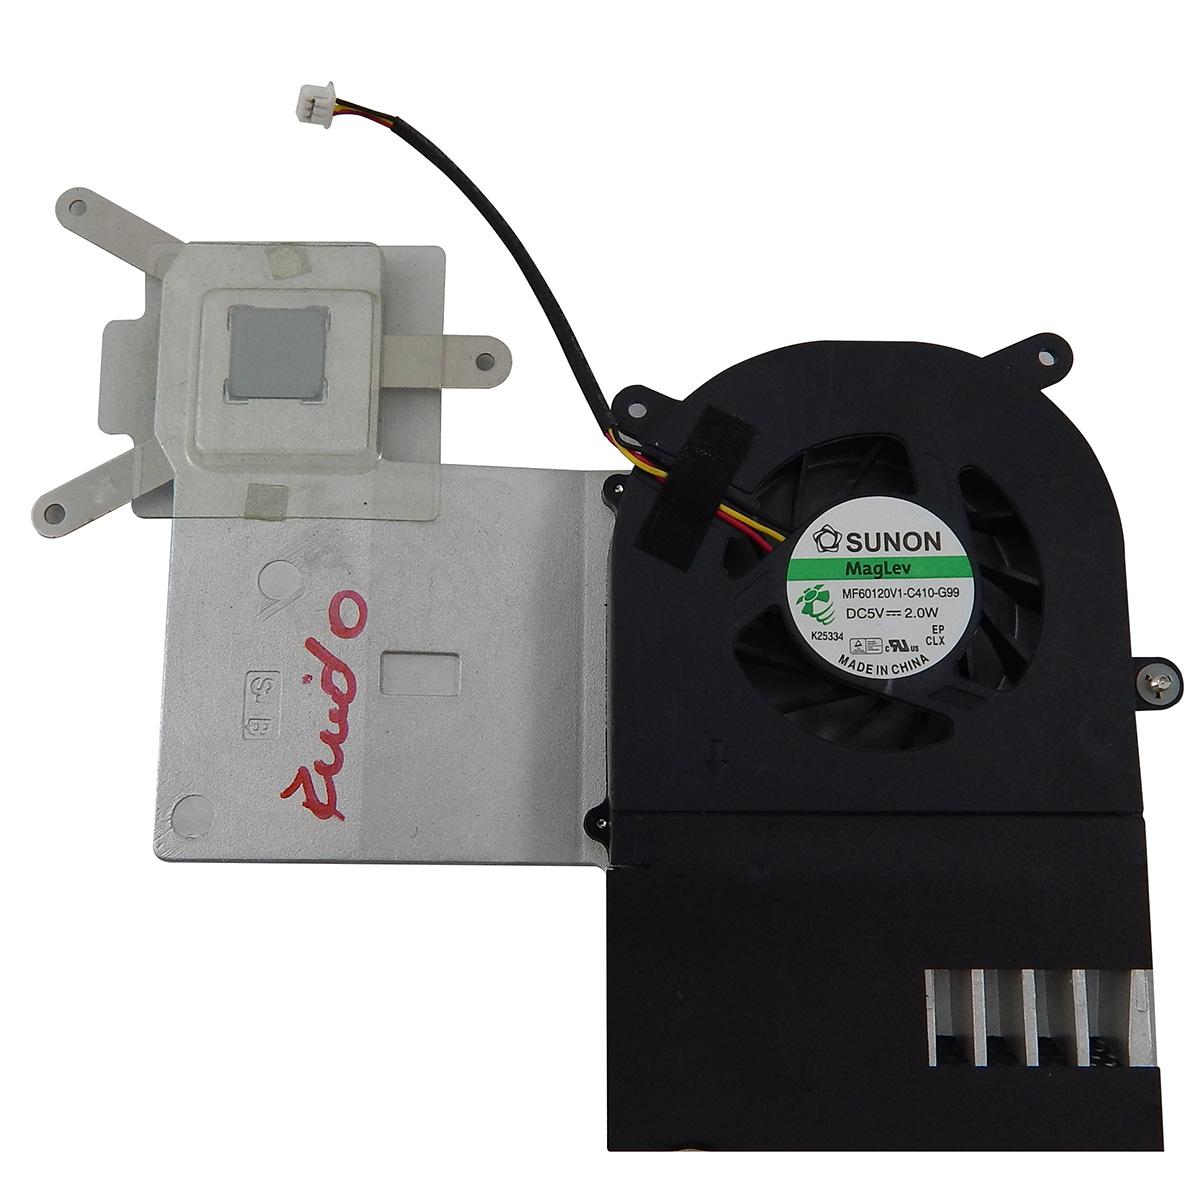 Cooler Fan com Dissipador para Notebook Pn: MF60120V1-C410-G99 / 49R-3C14E0-1401